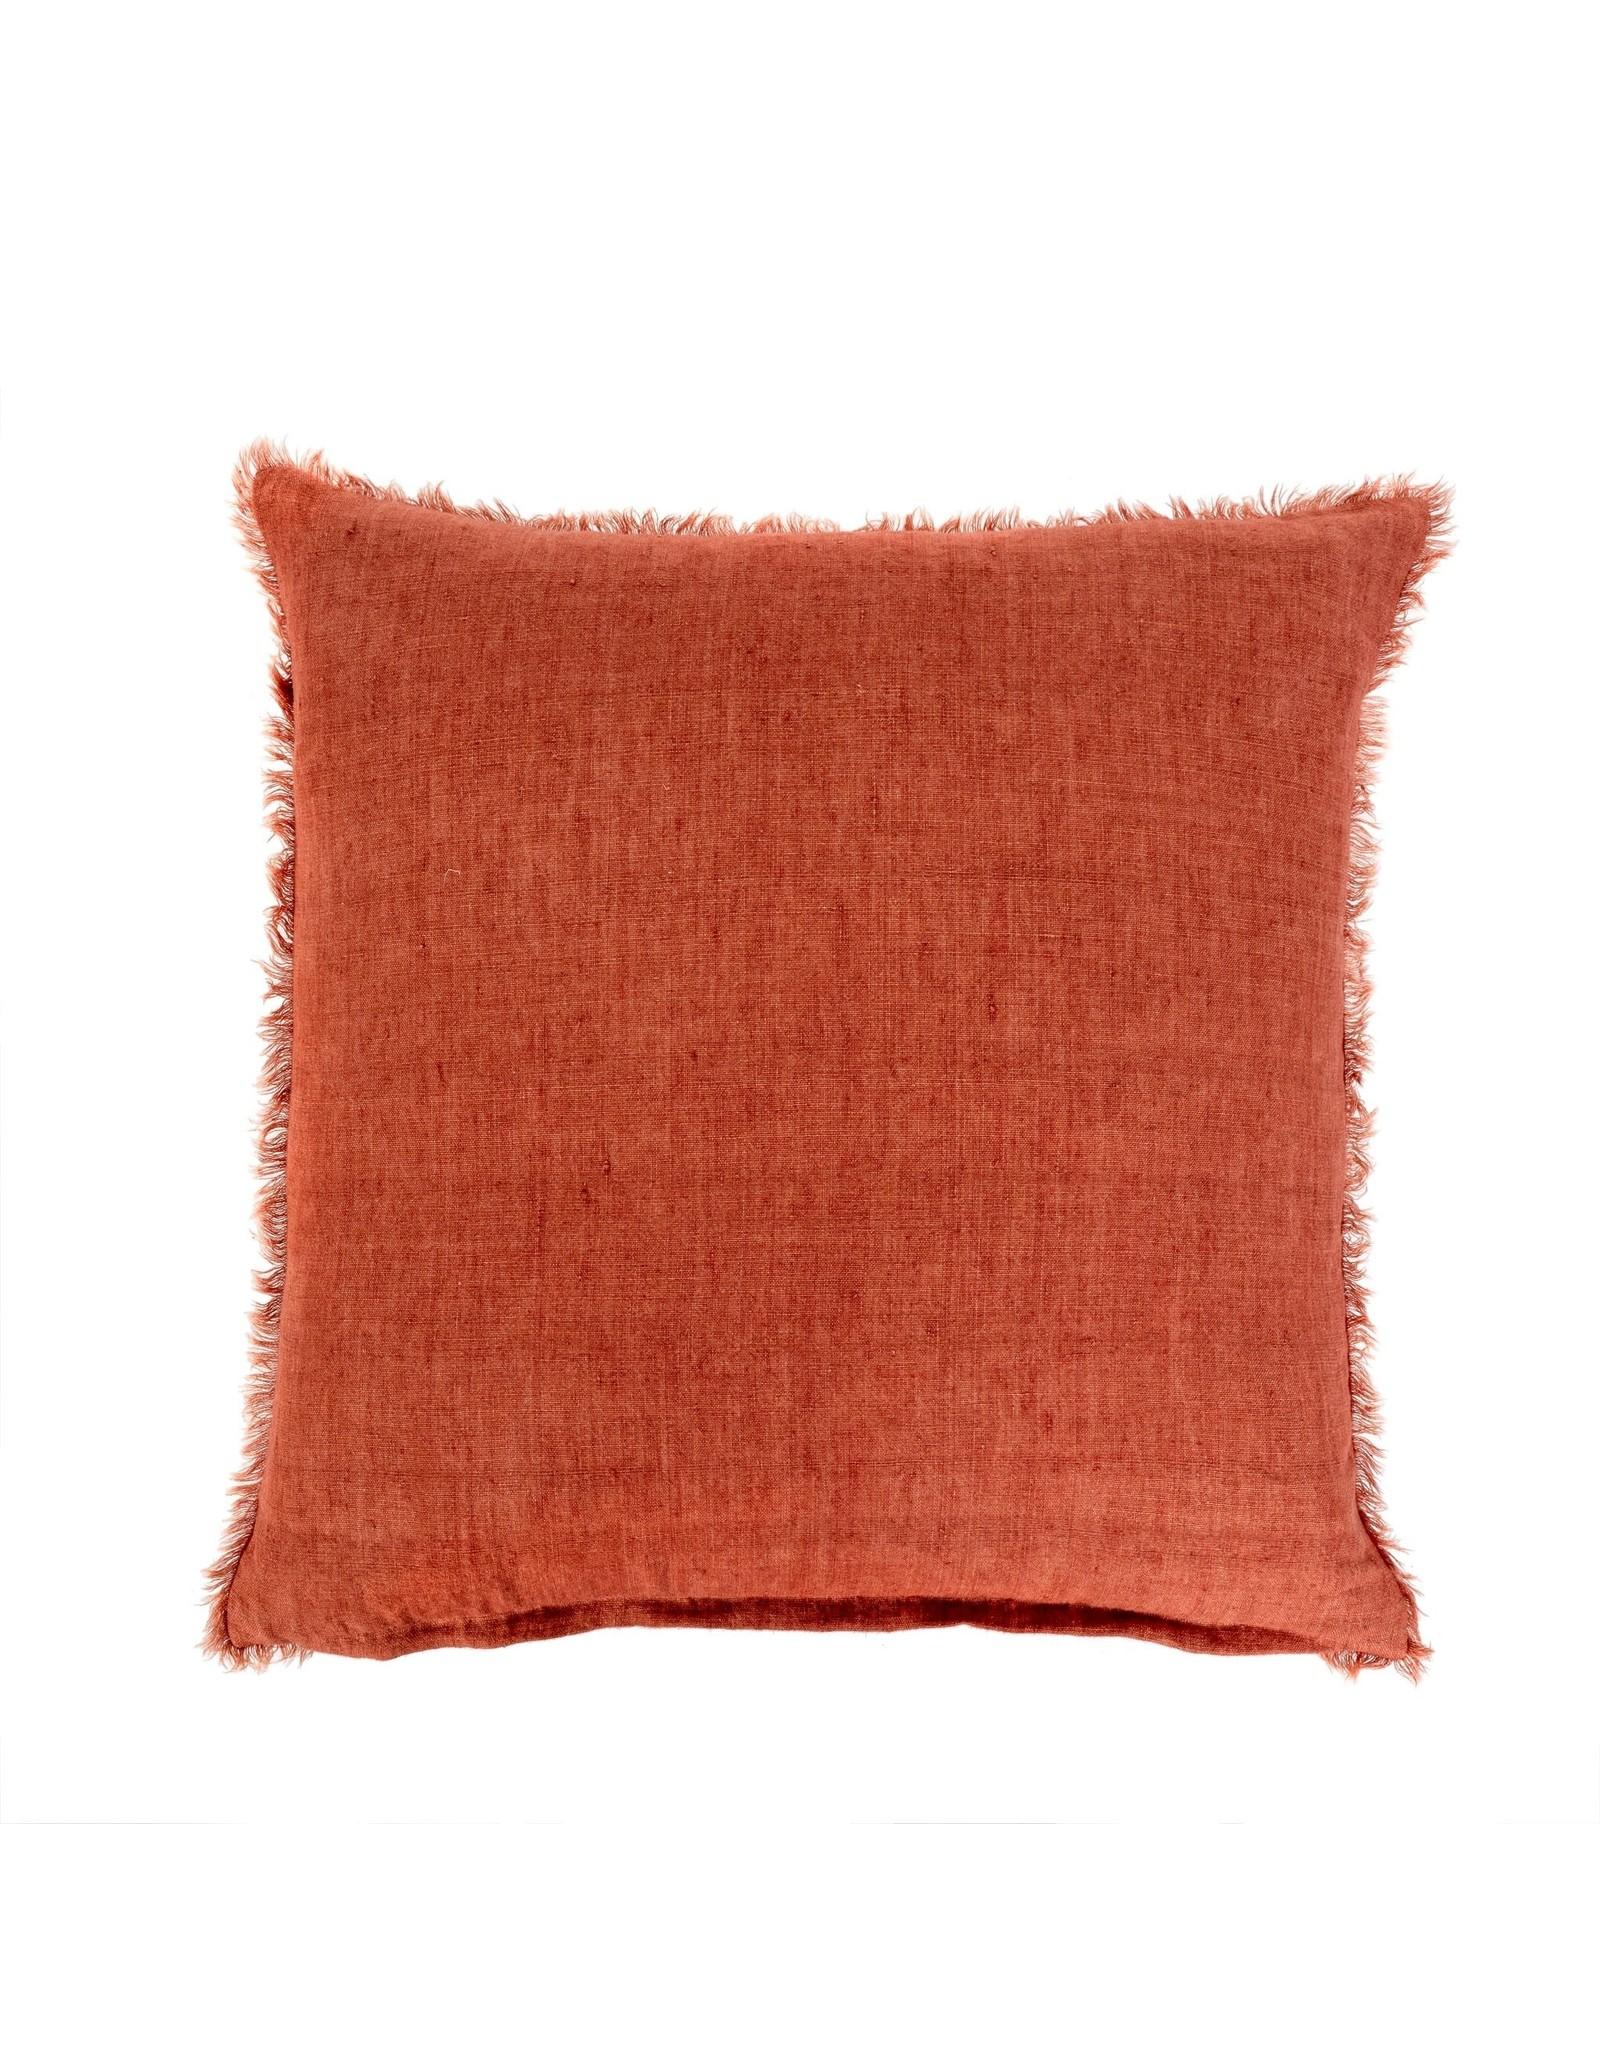 24x24 Lina Linen Cushion Rust